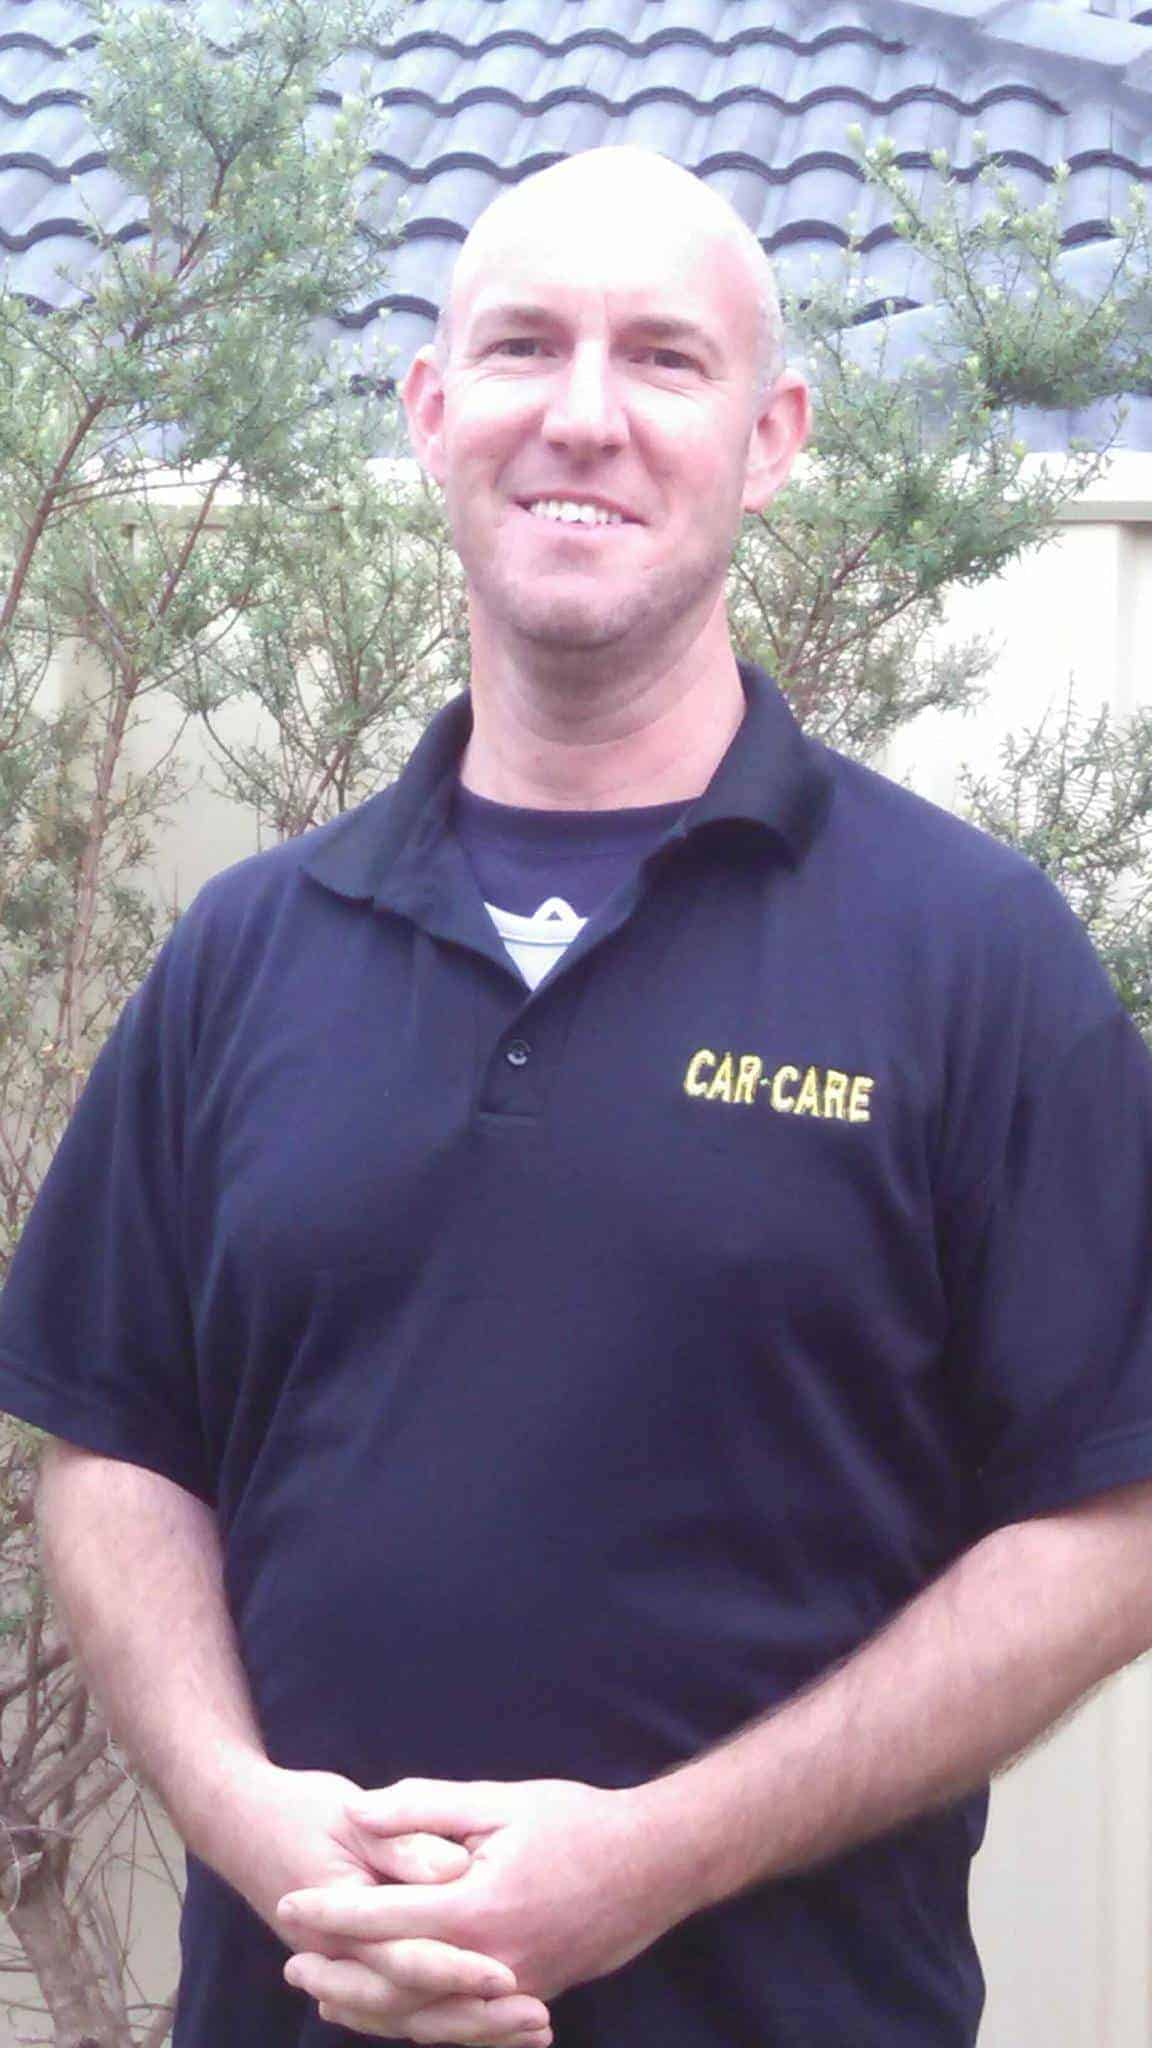 Patrick Floreat - Car Care